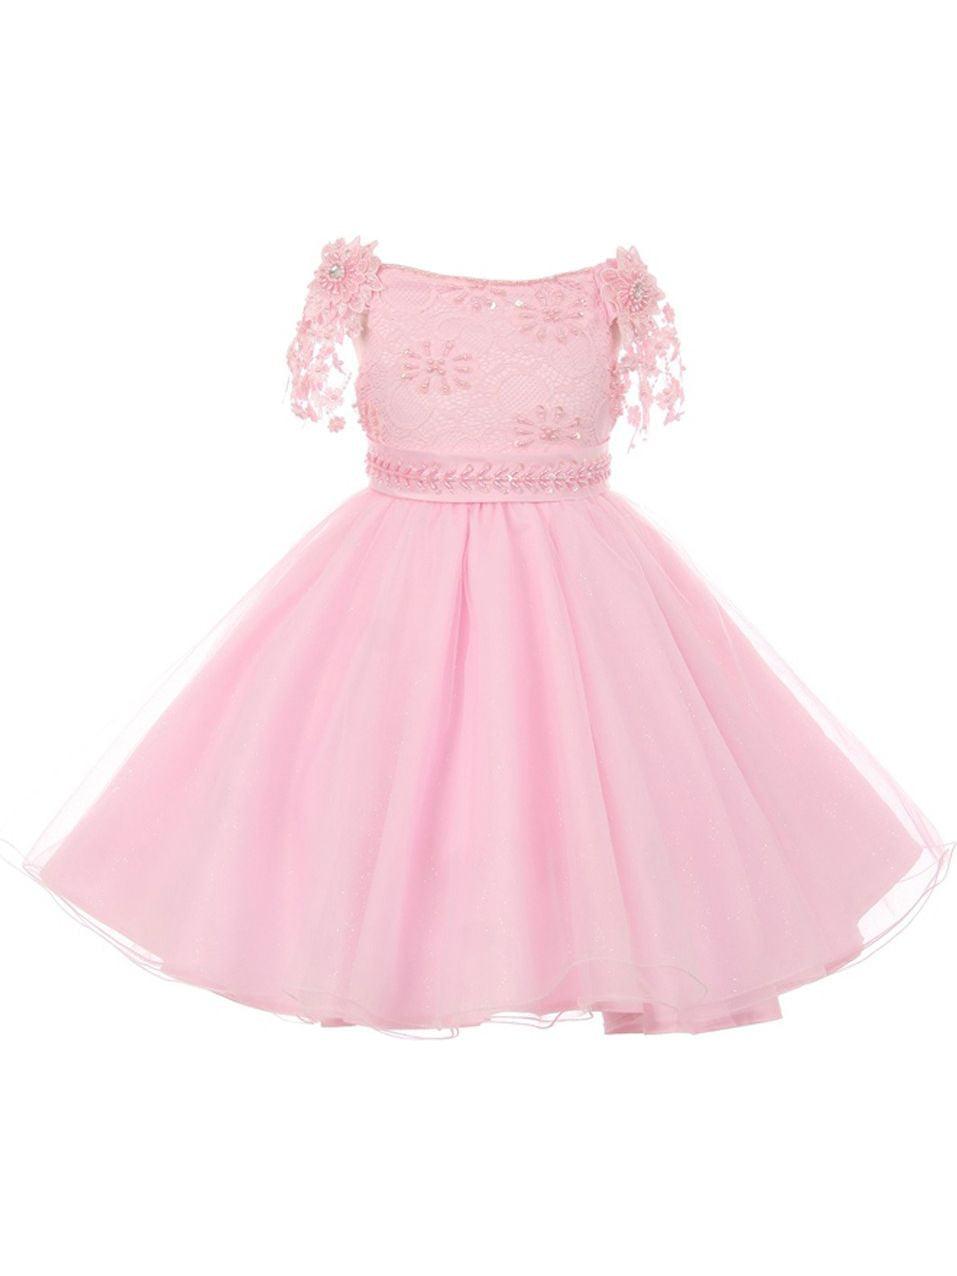 Girls Blush Pink Pearl Beaded Lace Sash Strap Junior Bridesmaid Dress